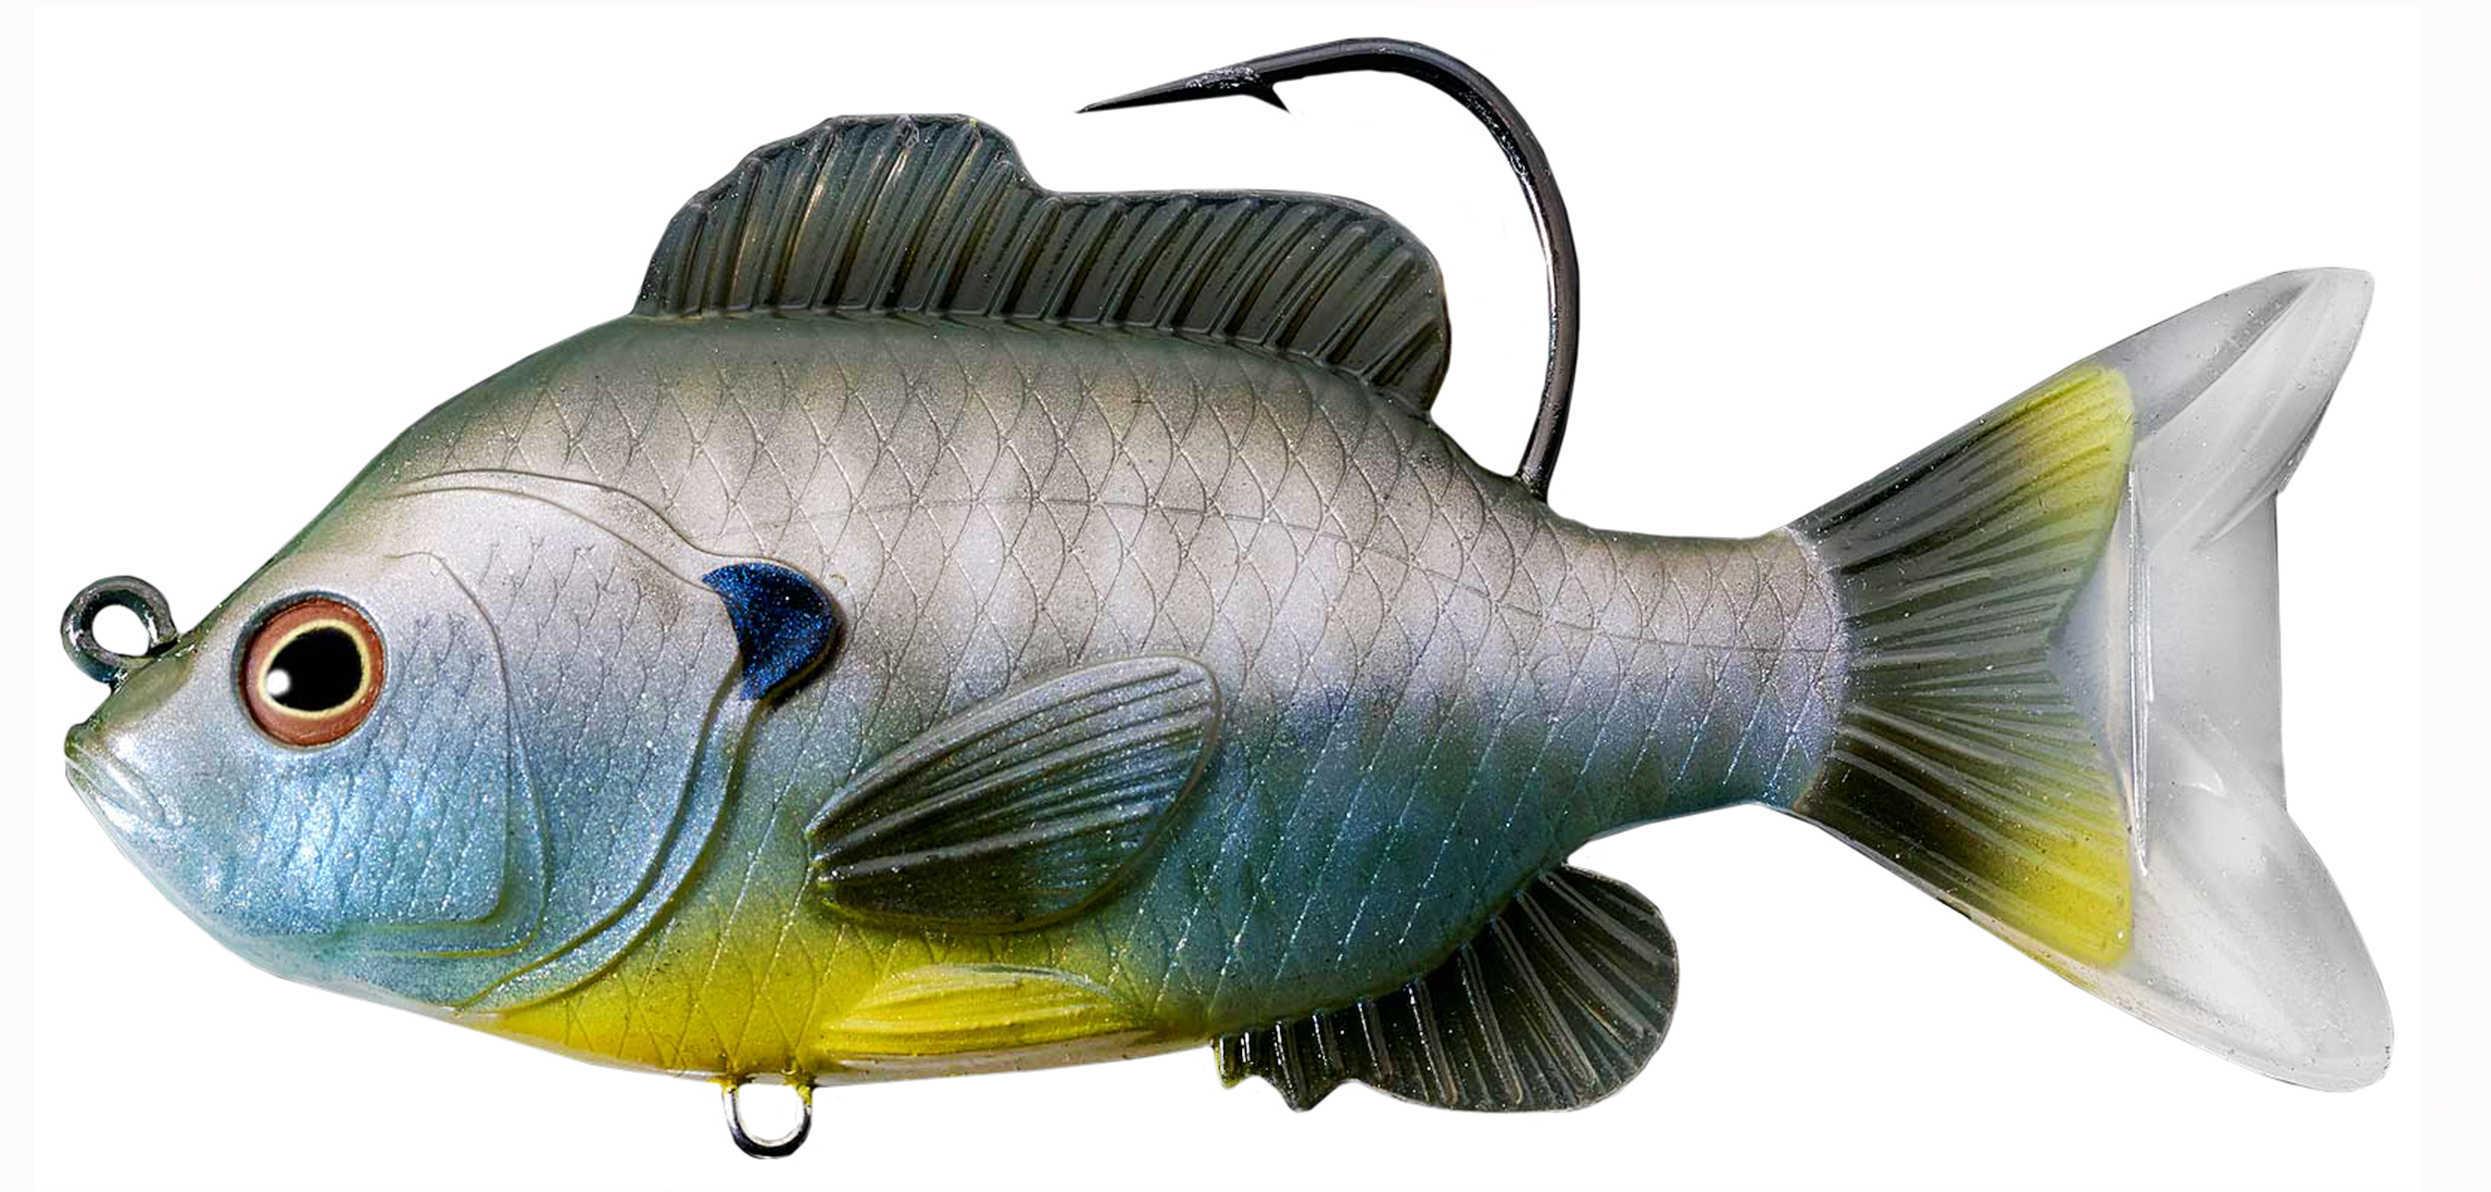 "LiveTarget Lures Sunfish Swimbait Freshwater, 5"" Length, 1 1/3 oz, 1'-8' Depth, Natural/Blue Natural Bluegi, Per 1 Md: S"